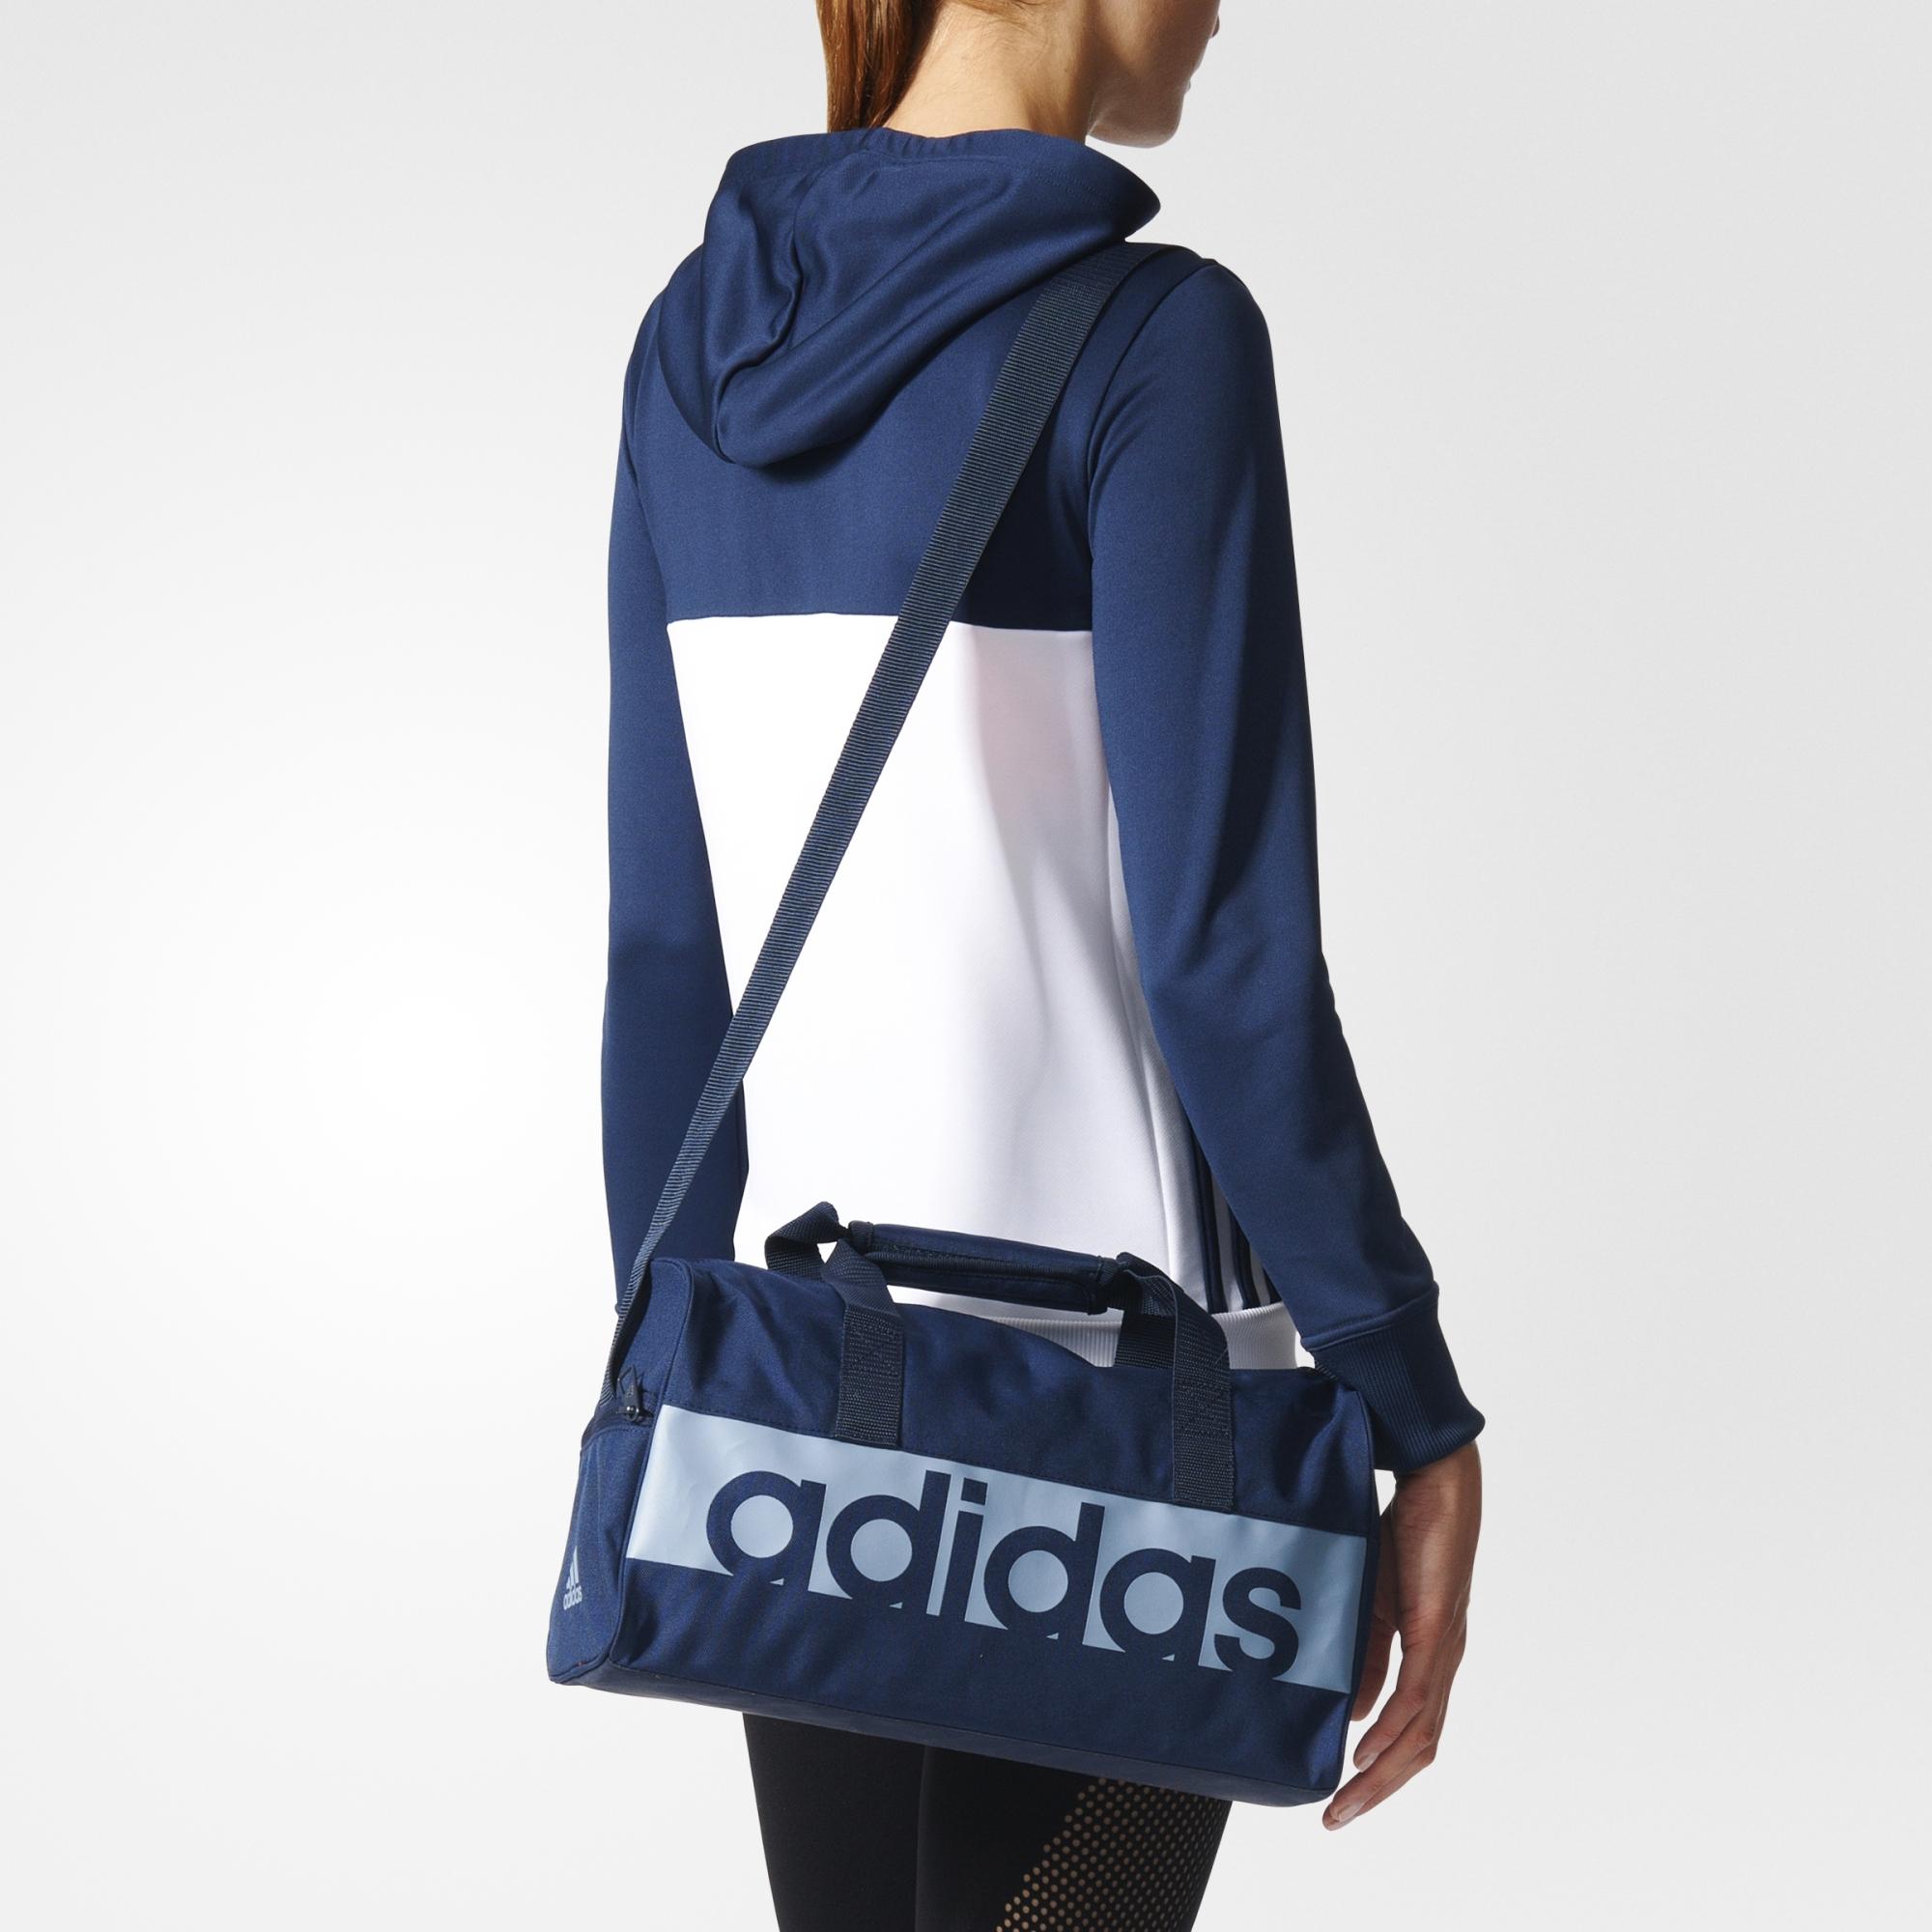 8e519b721046 Adidas Lin Per TB XS S99951 Unisex | Utazó-, sporttáska